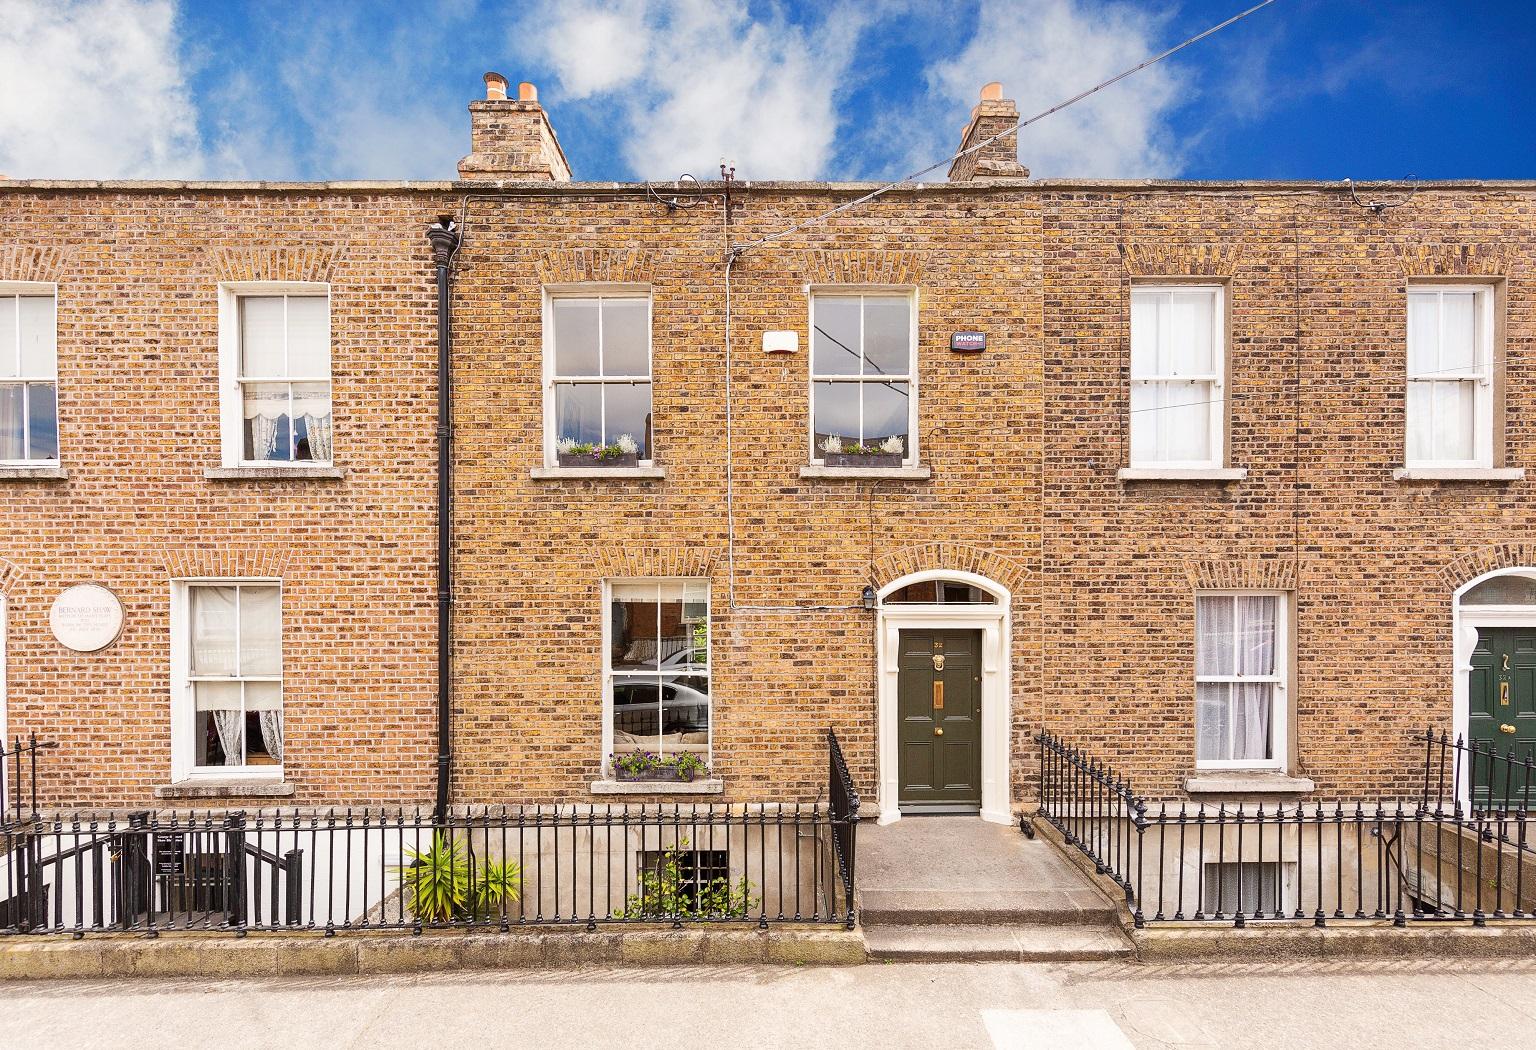 32 Synge Street, Portobello, Dublin 8